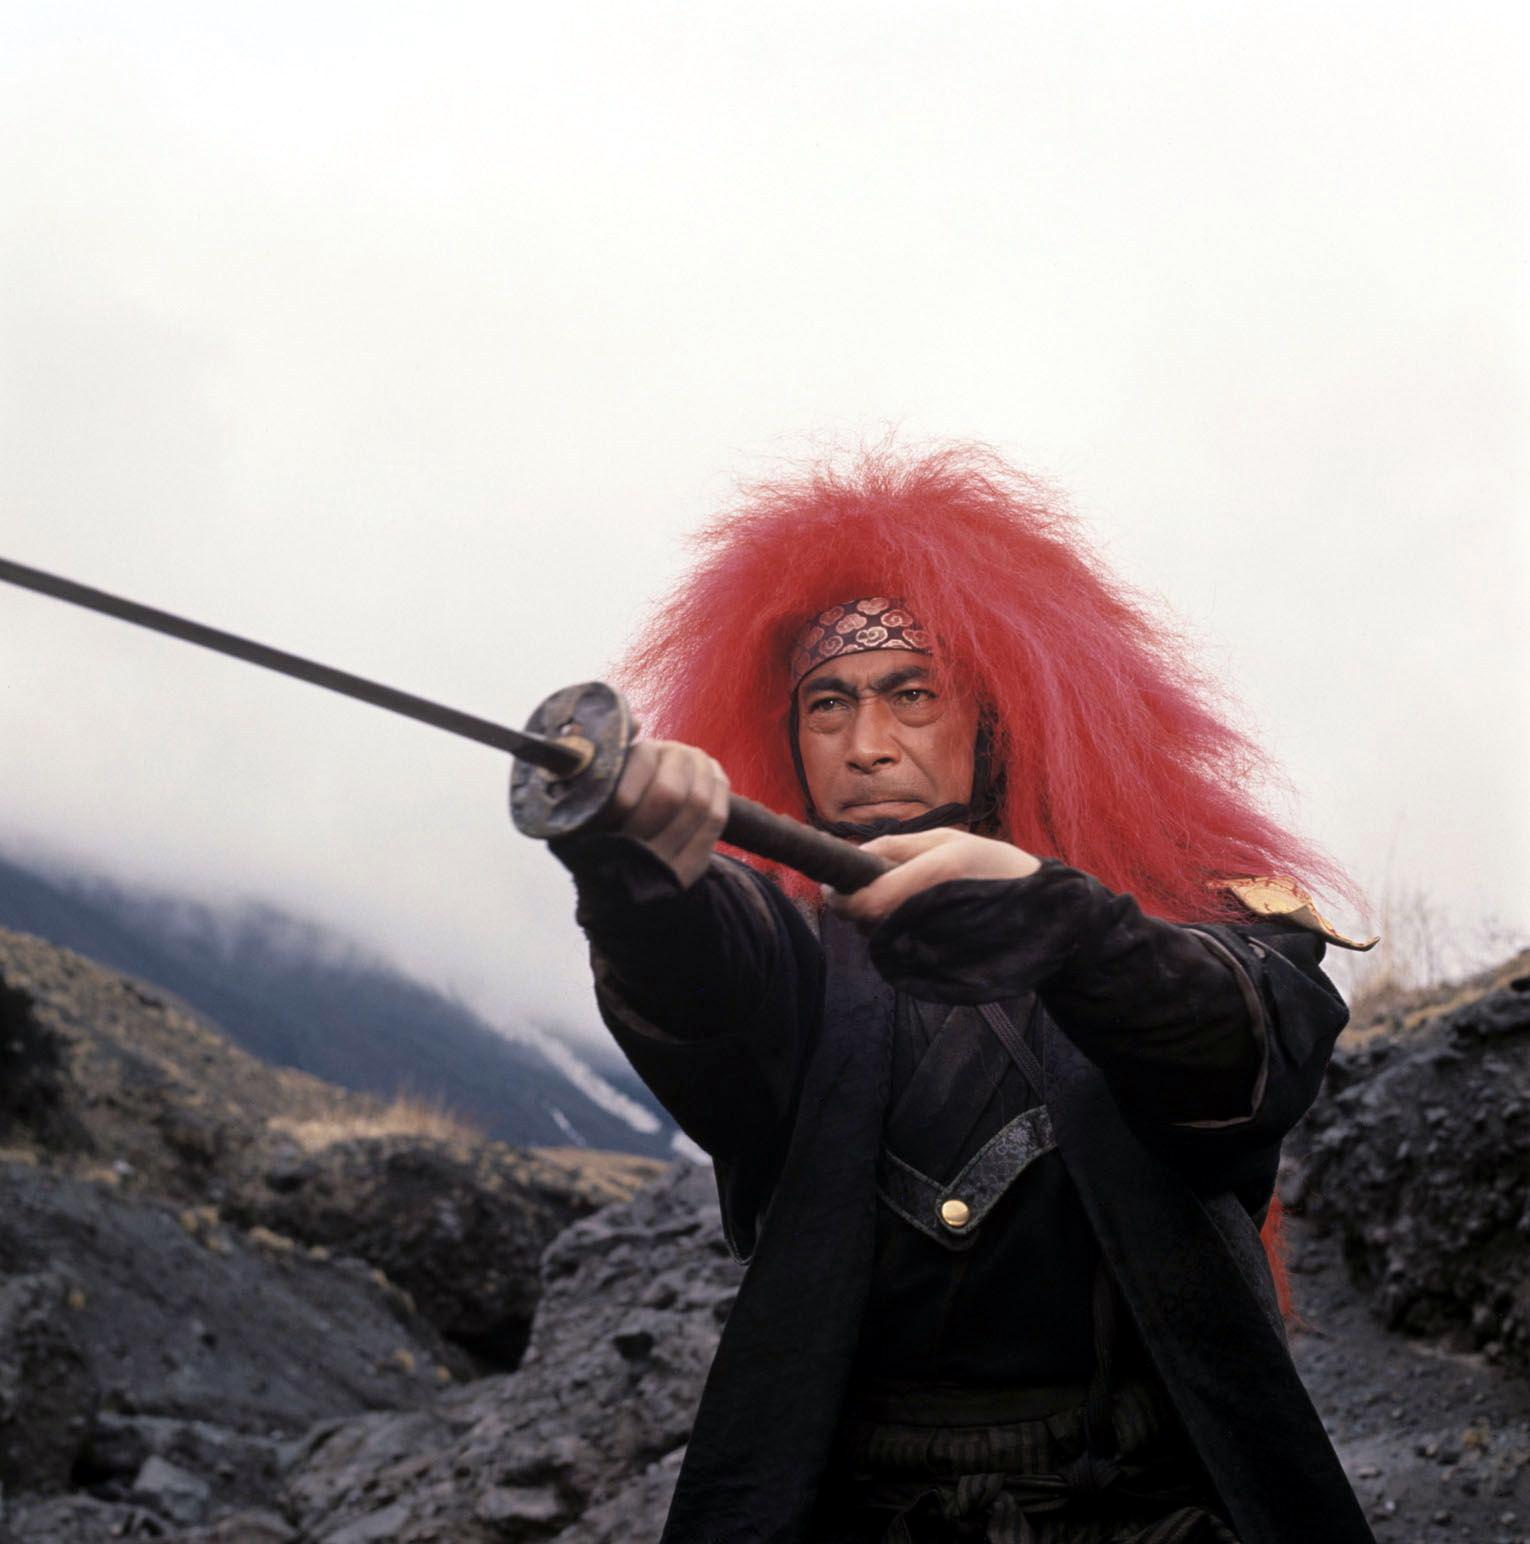 Toshiro Mifune Backgrounds on Wallpapers Vista